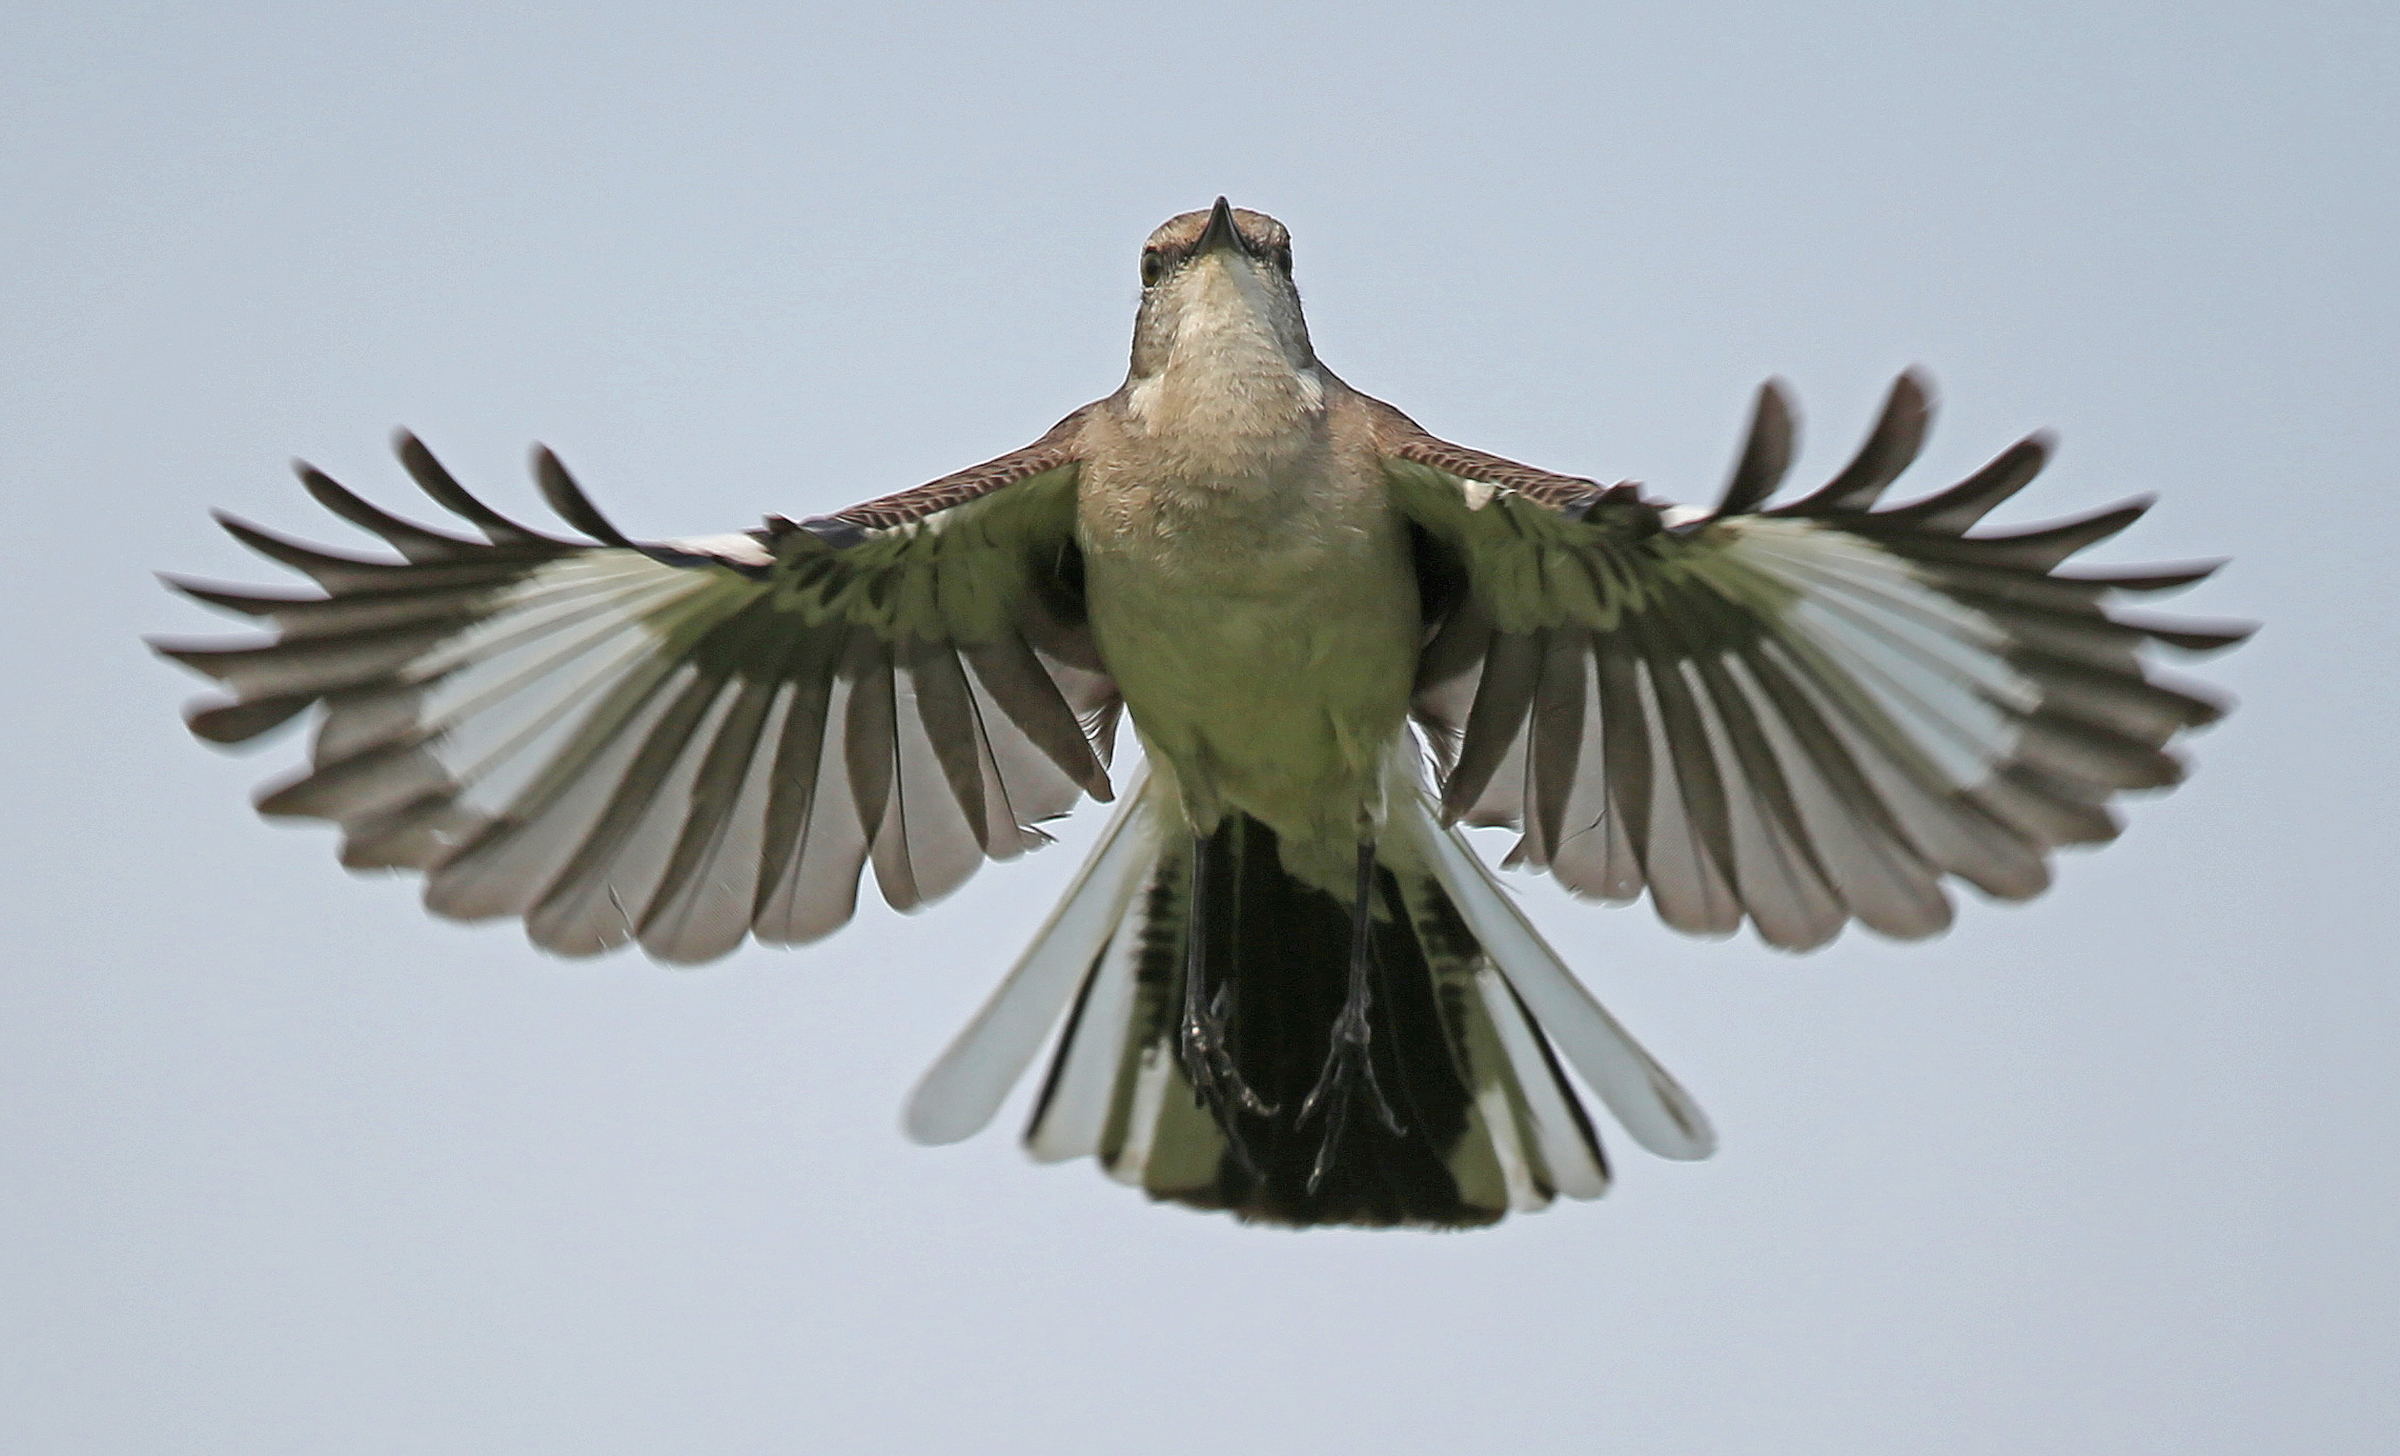 Northern Mockingbird, Anthony Goldman